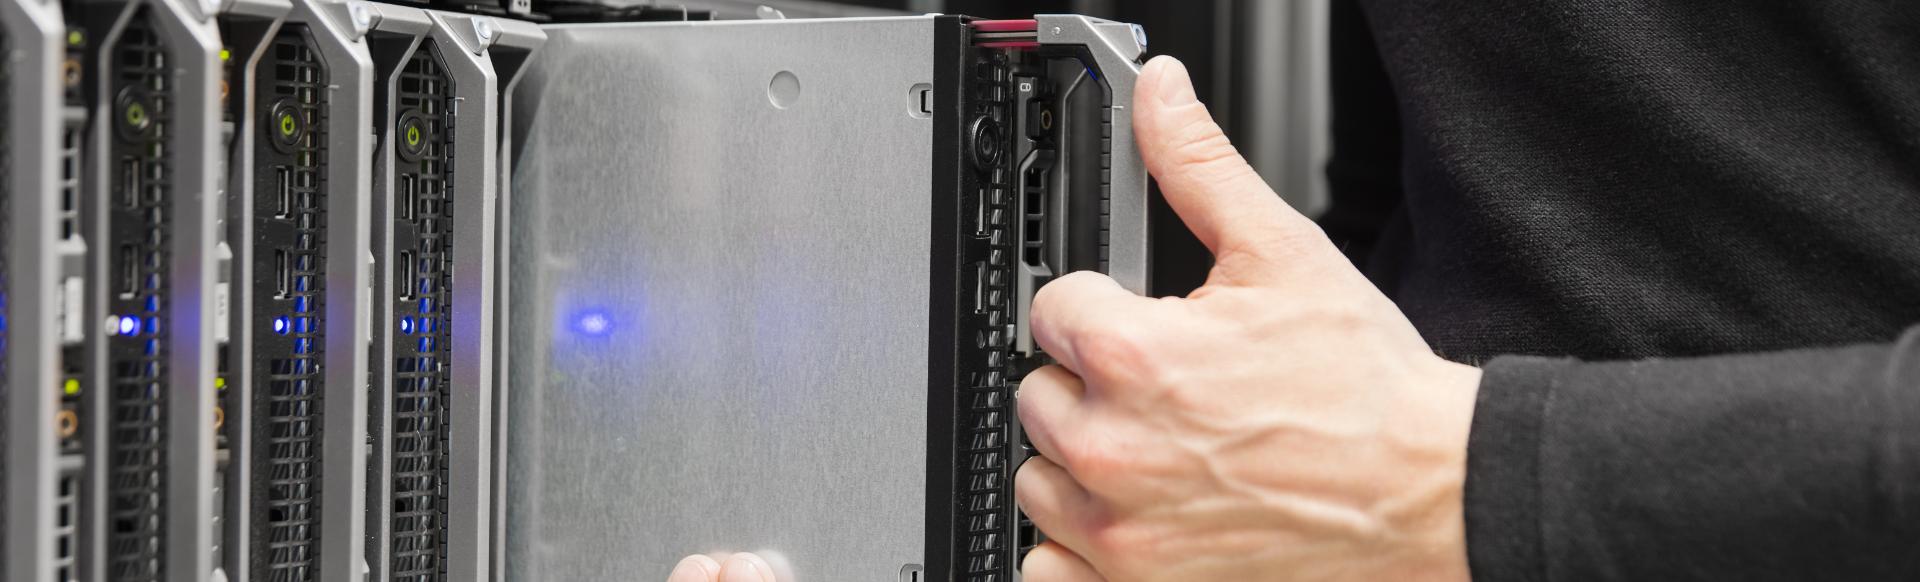 blade-server-installation-in-large-datacenter-2021-04-02-20-18-54-utc.png